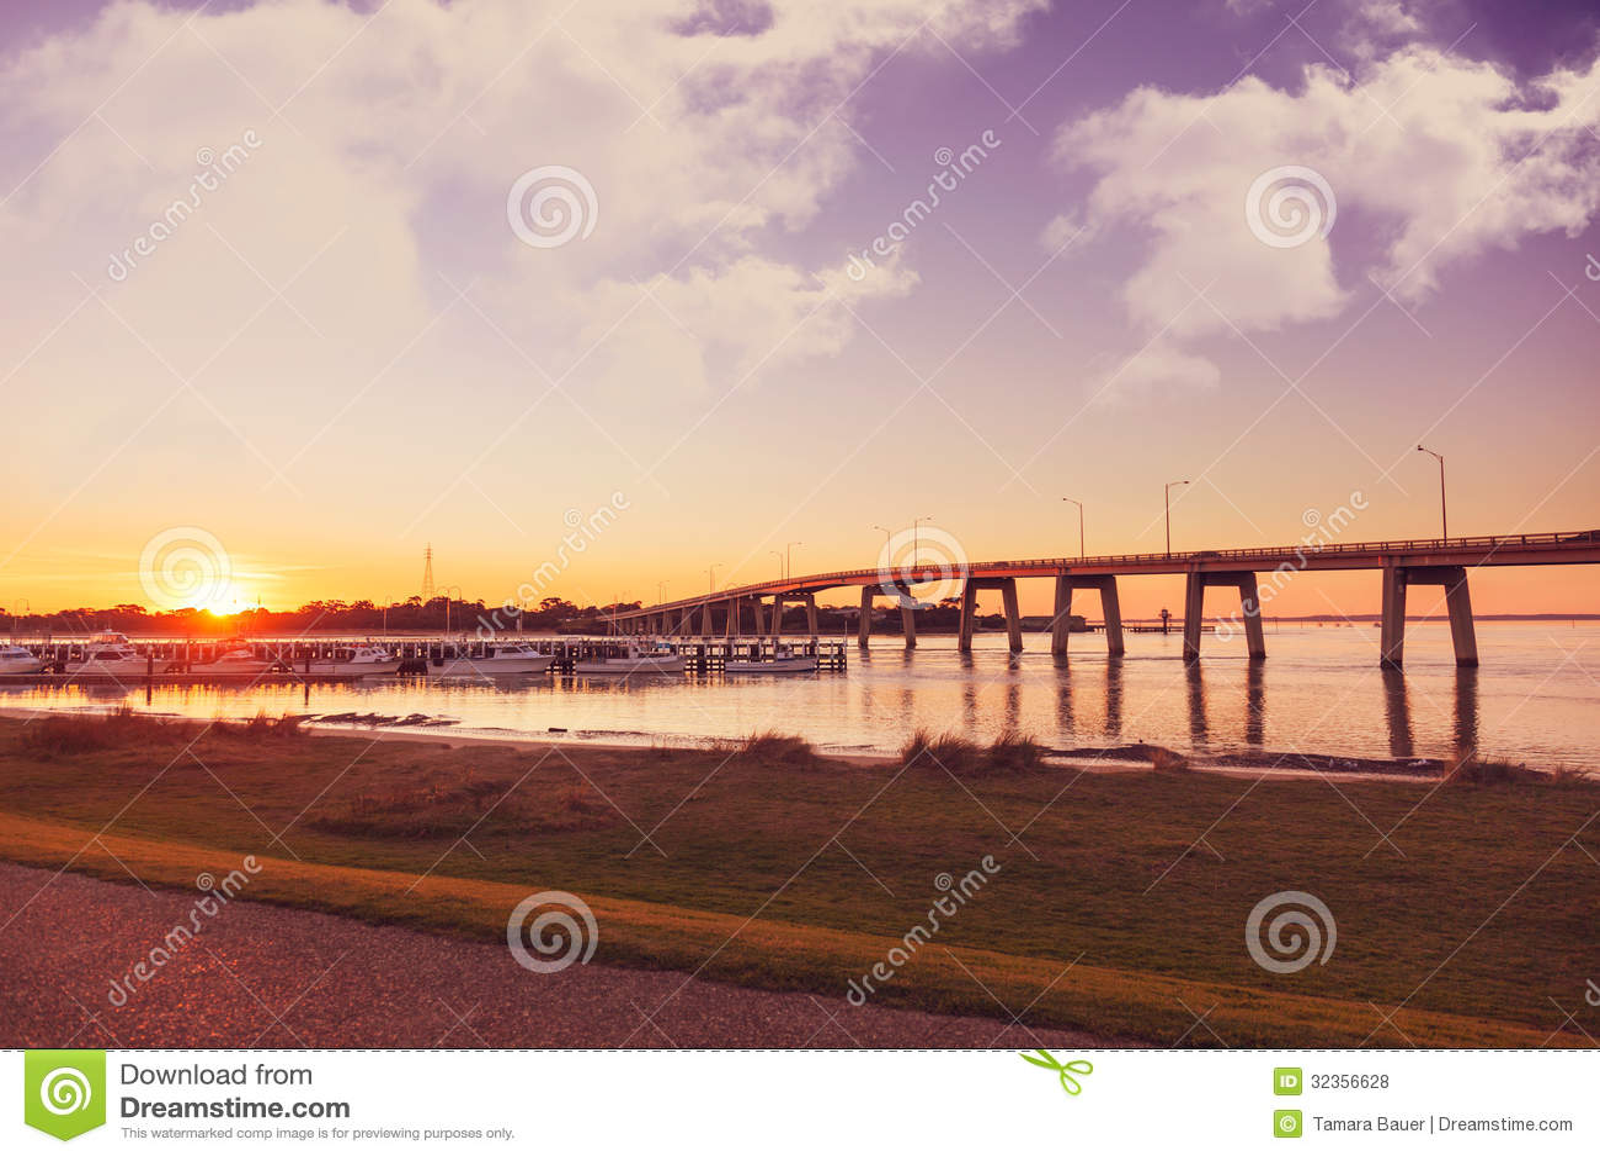 Phillip Island Sunset Time